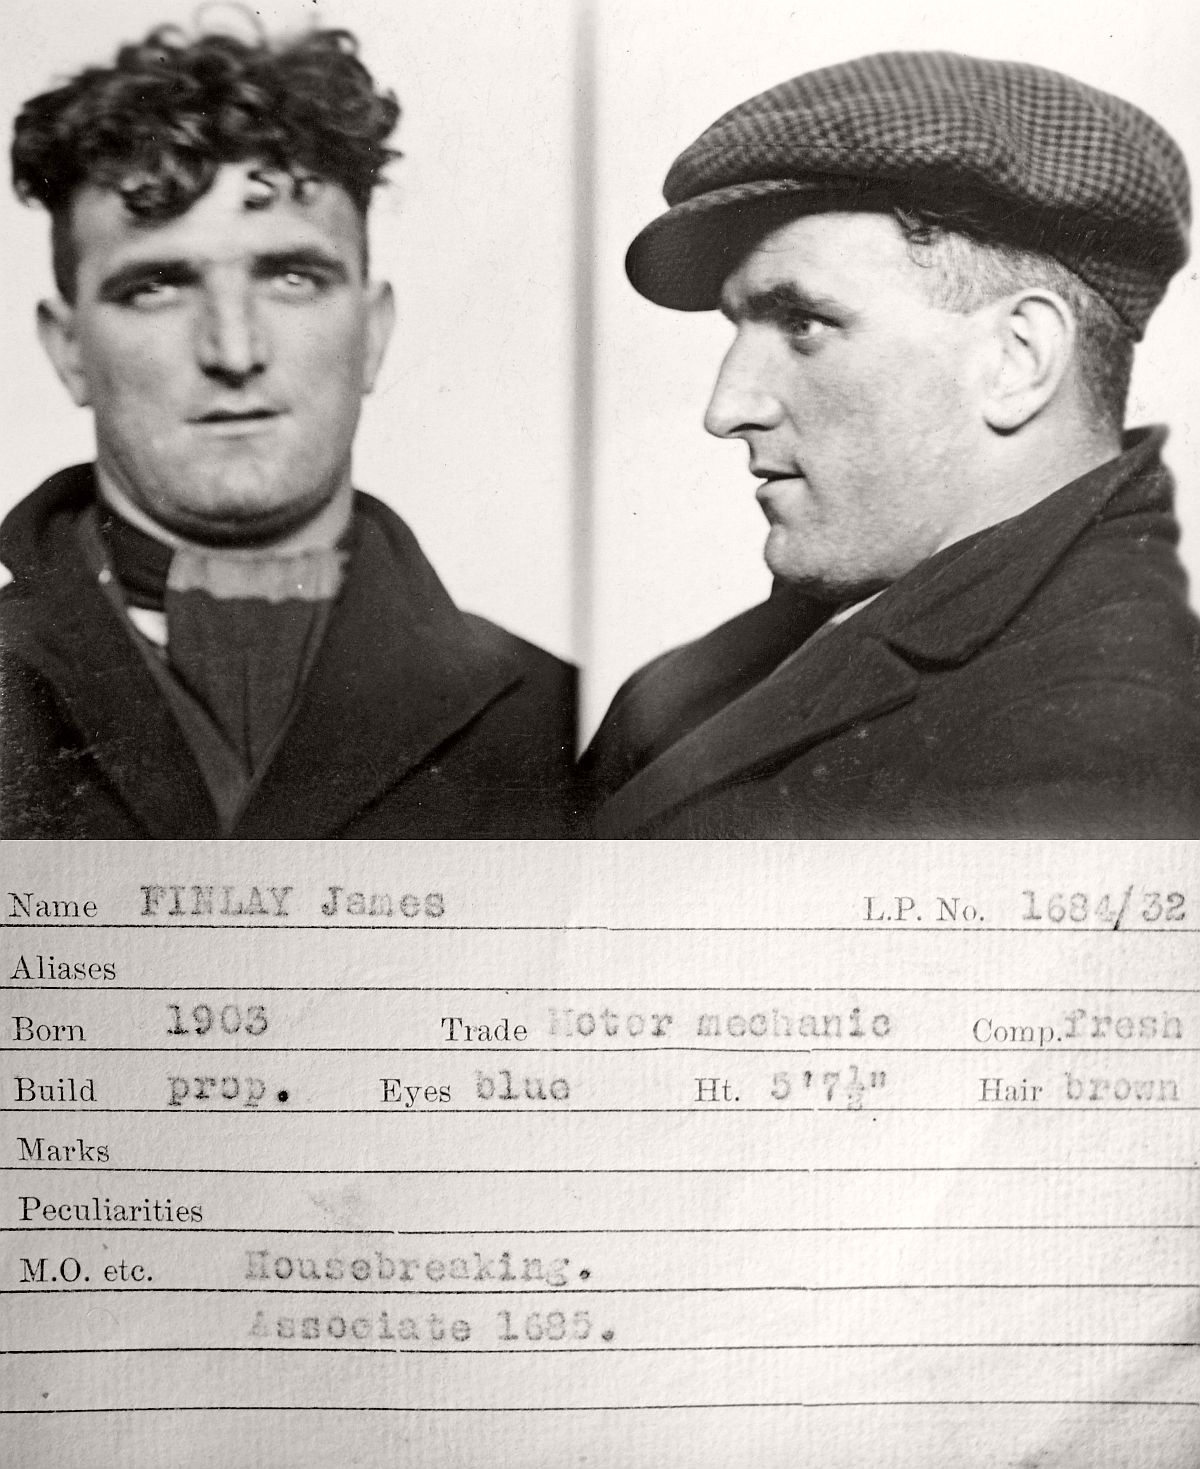 vintage-mug-shot-of-criminals-from-newcastle-upon-tyne-1930s-08